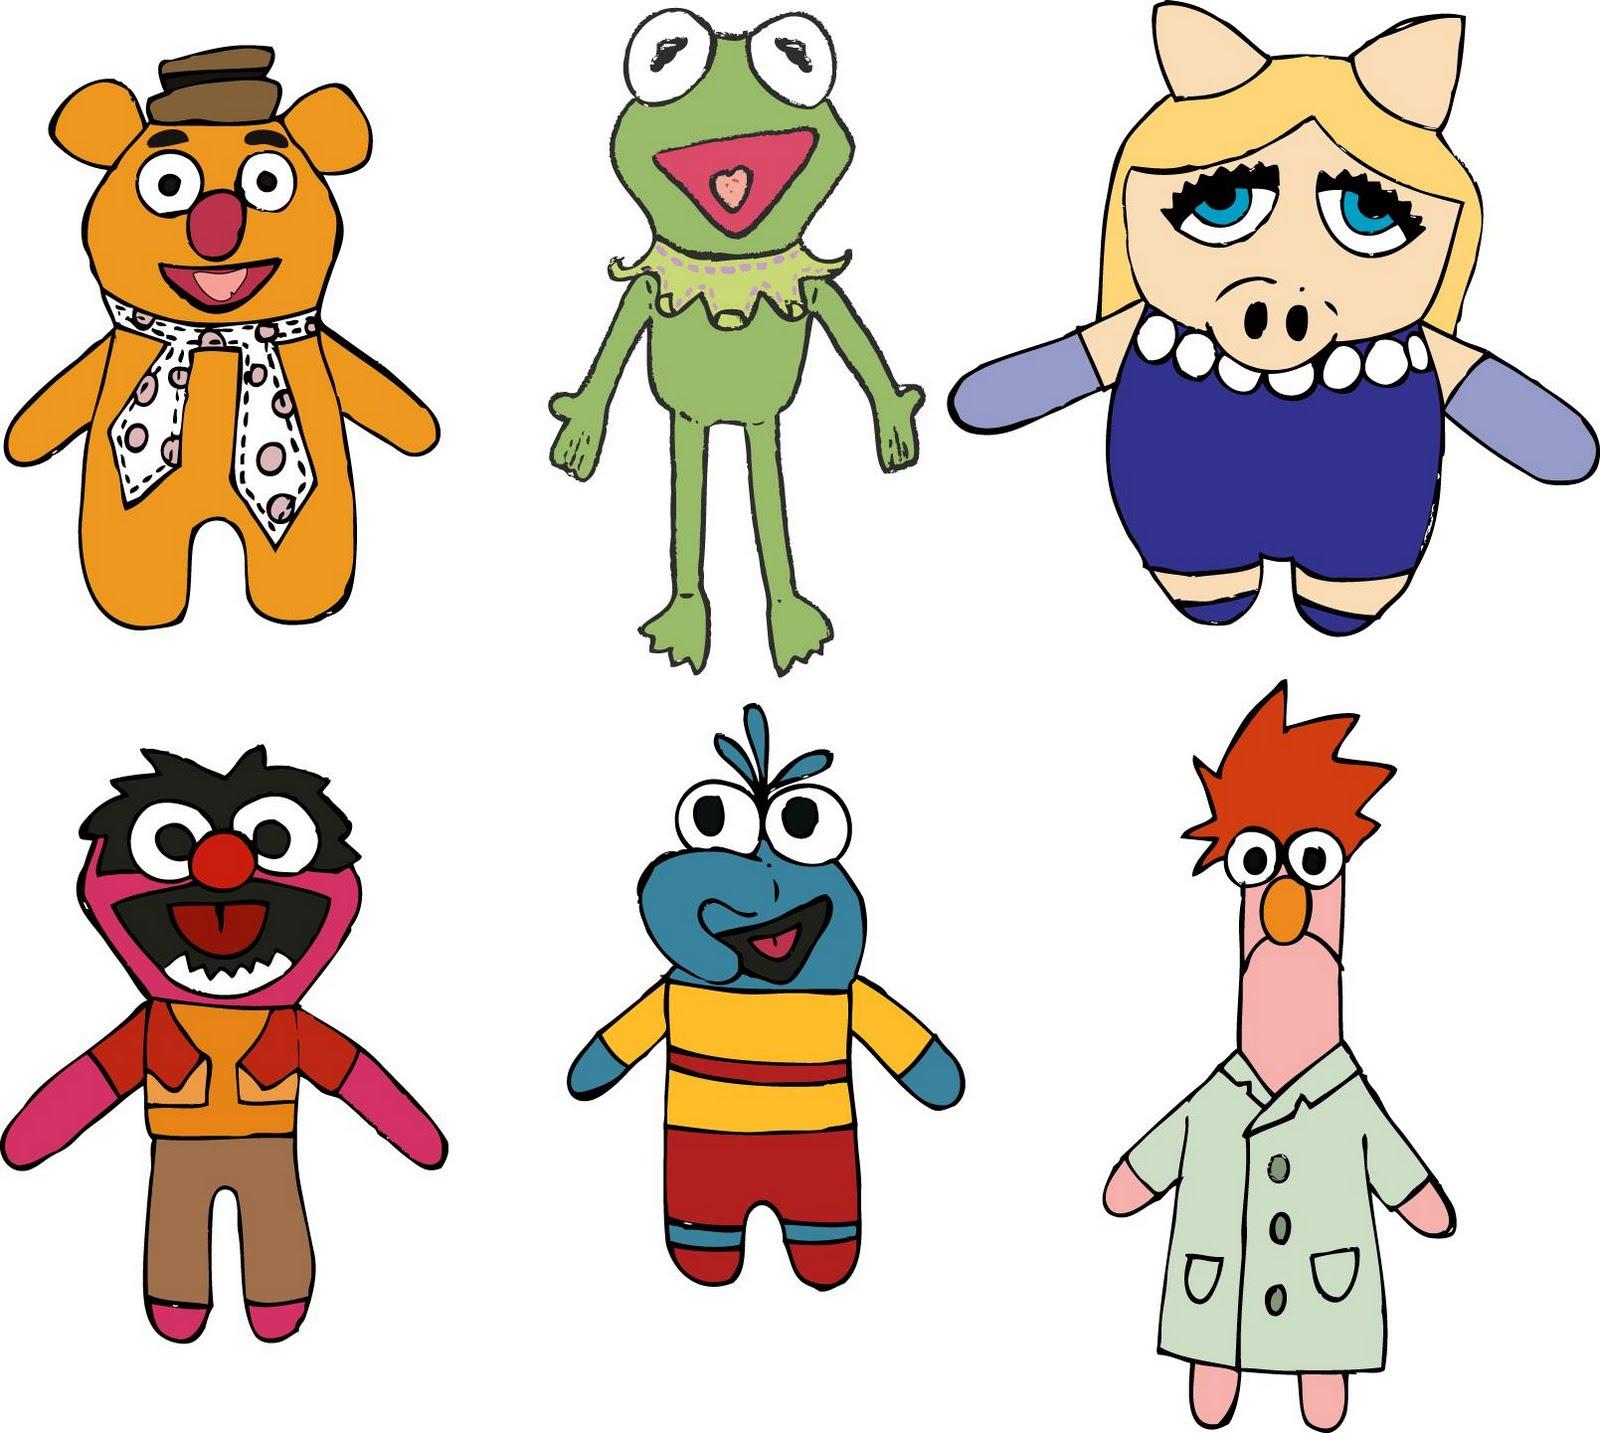 http://1.bp.blogspot.com/-Cgek67pSWos/TlR8ylEz5MI/AAAAAAAAAVs/y5ekk7ajRsU/s1600/muppets.jpg